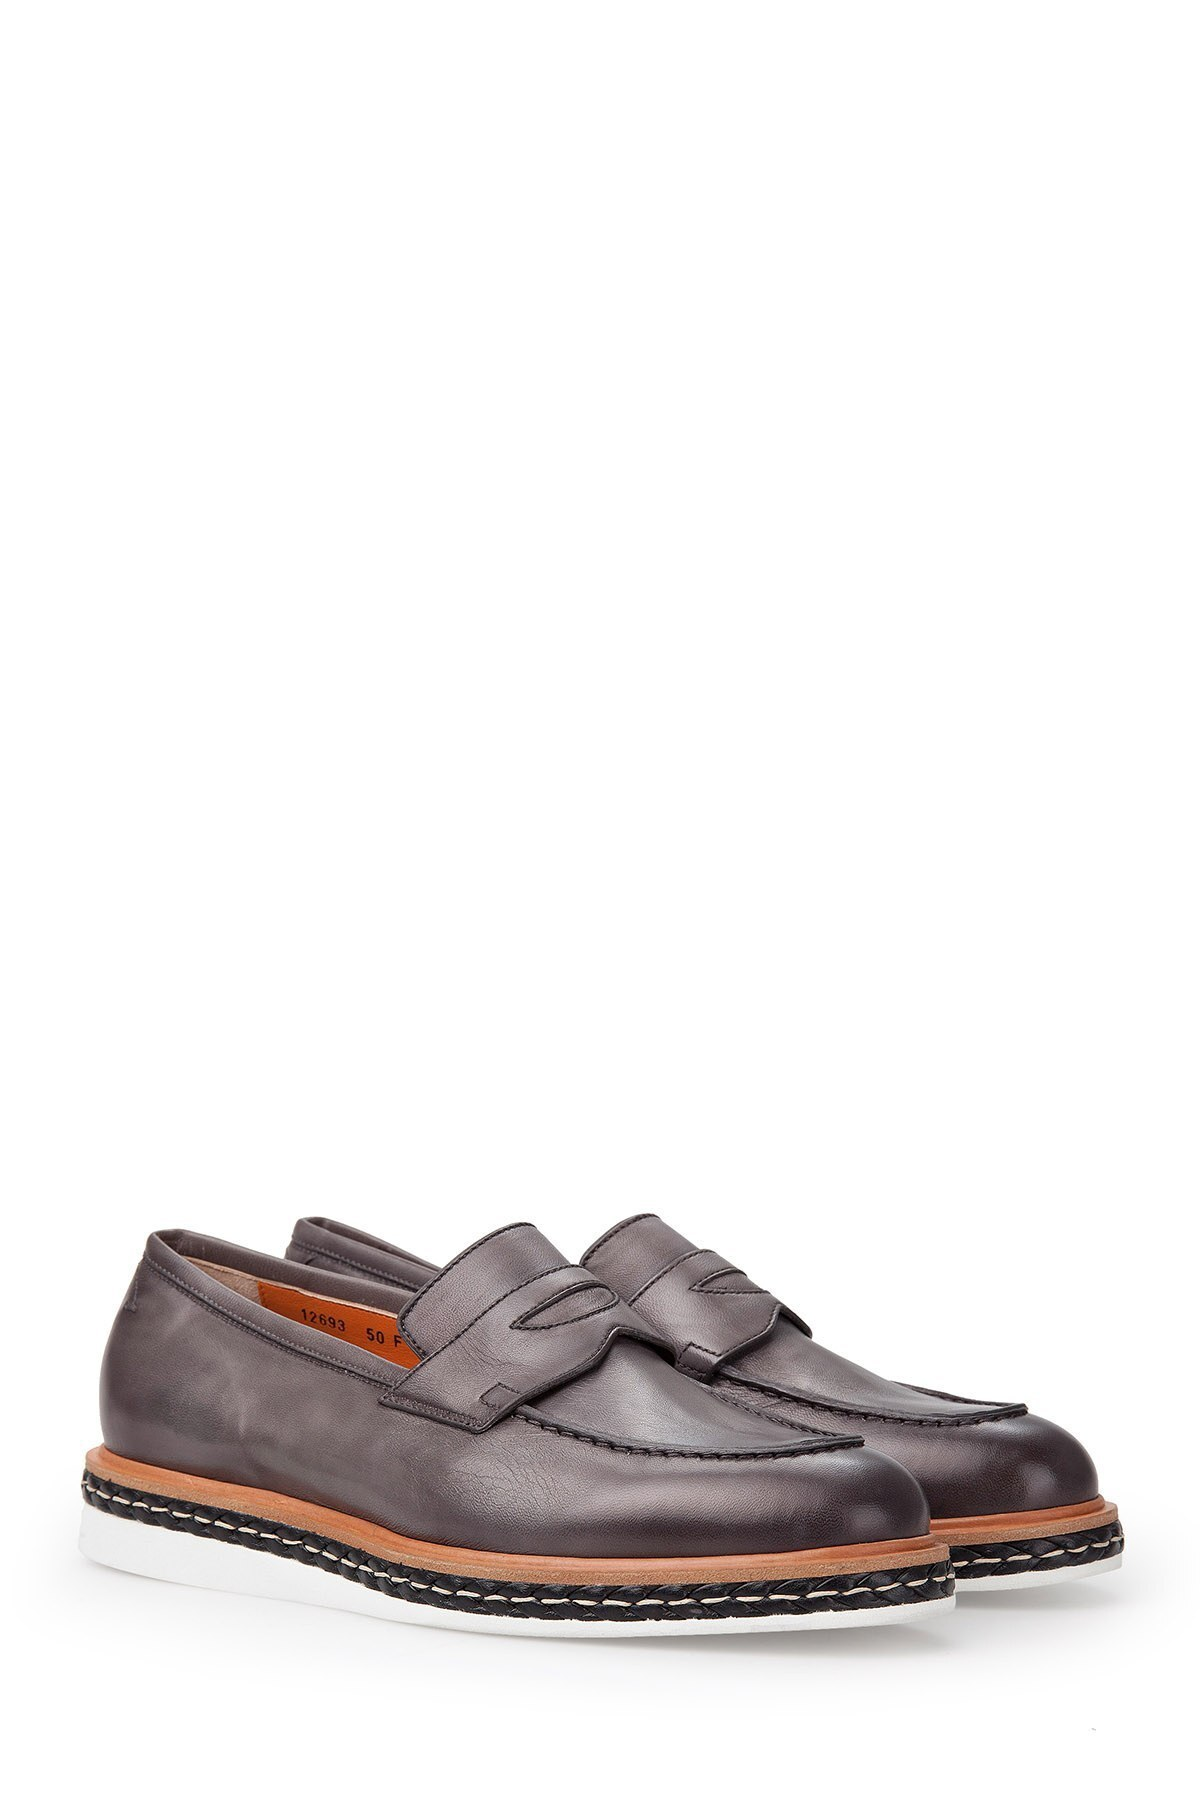 SANTONI Erkek Ayakkabı MGHI12693JW3GNDTG50 FÜME